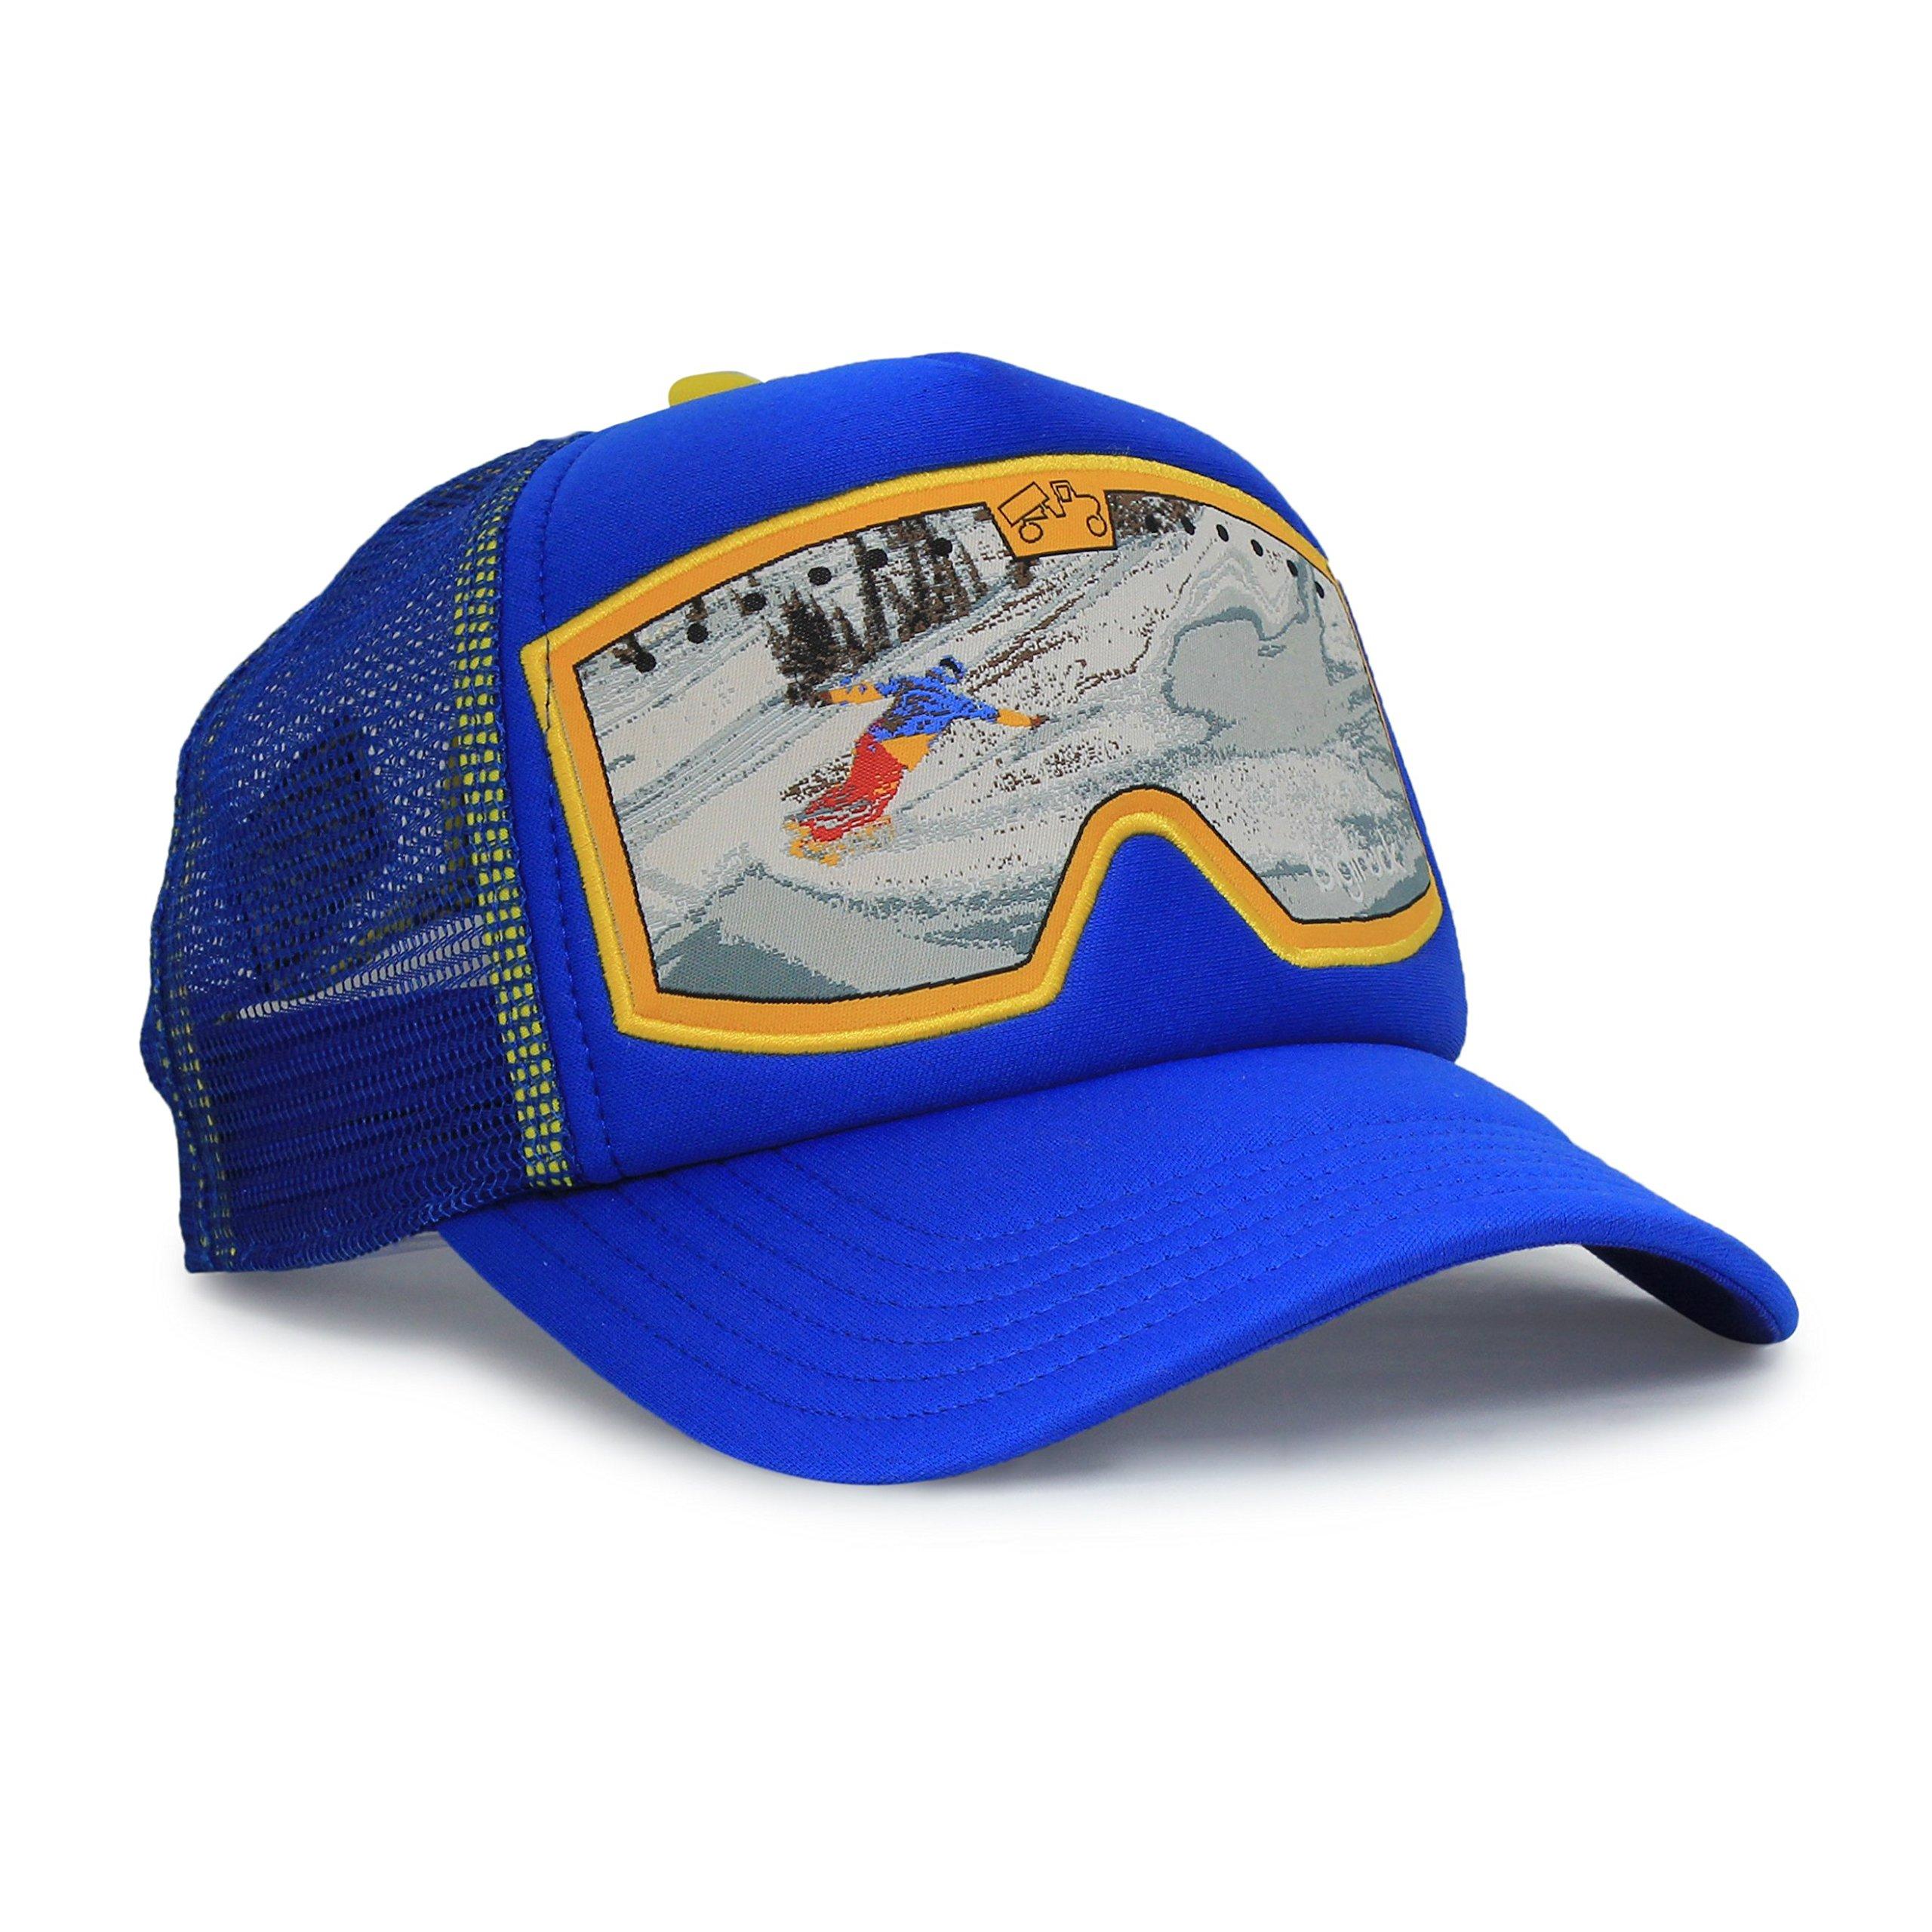 bigtruck Blue Original Kids Trucker Hat, Blue C, 54cm